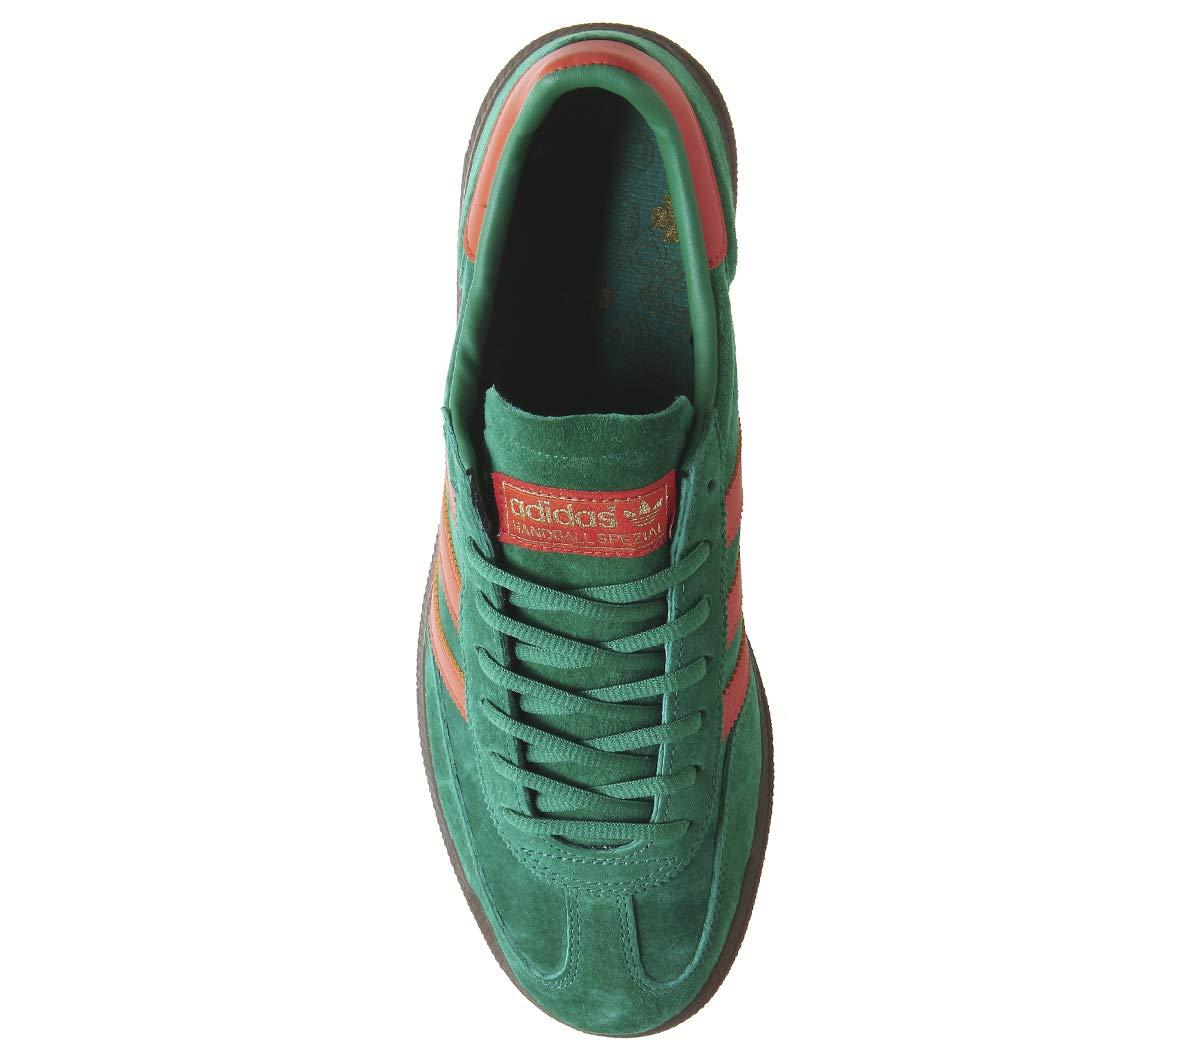 Adidas Adidas Adidas Handball Spzl Scarpe Uomo verde 44 0feadf